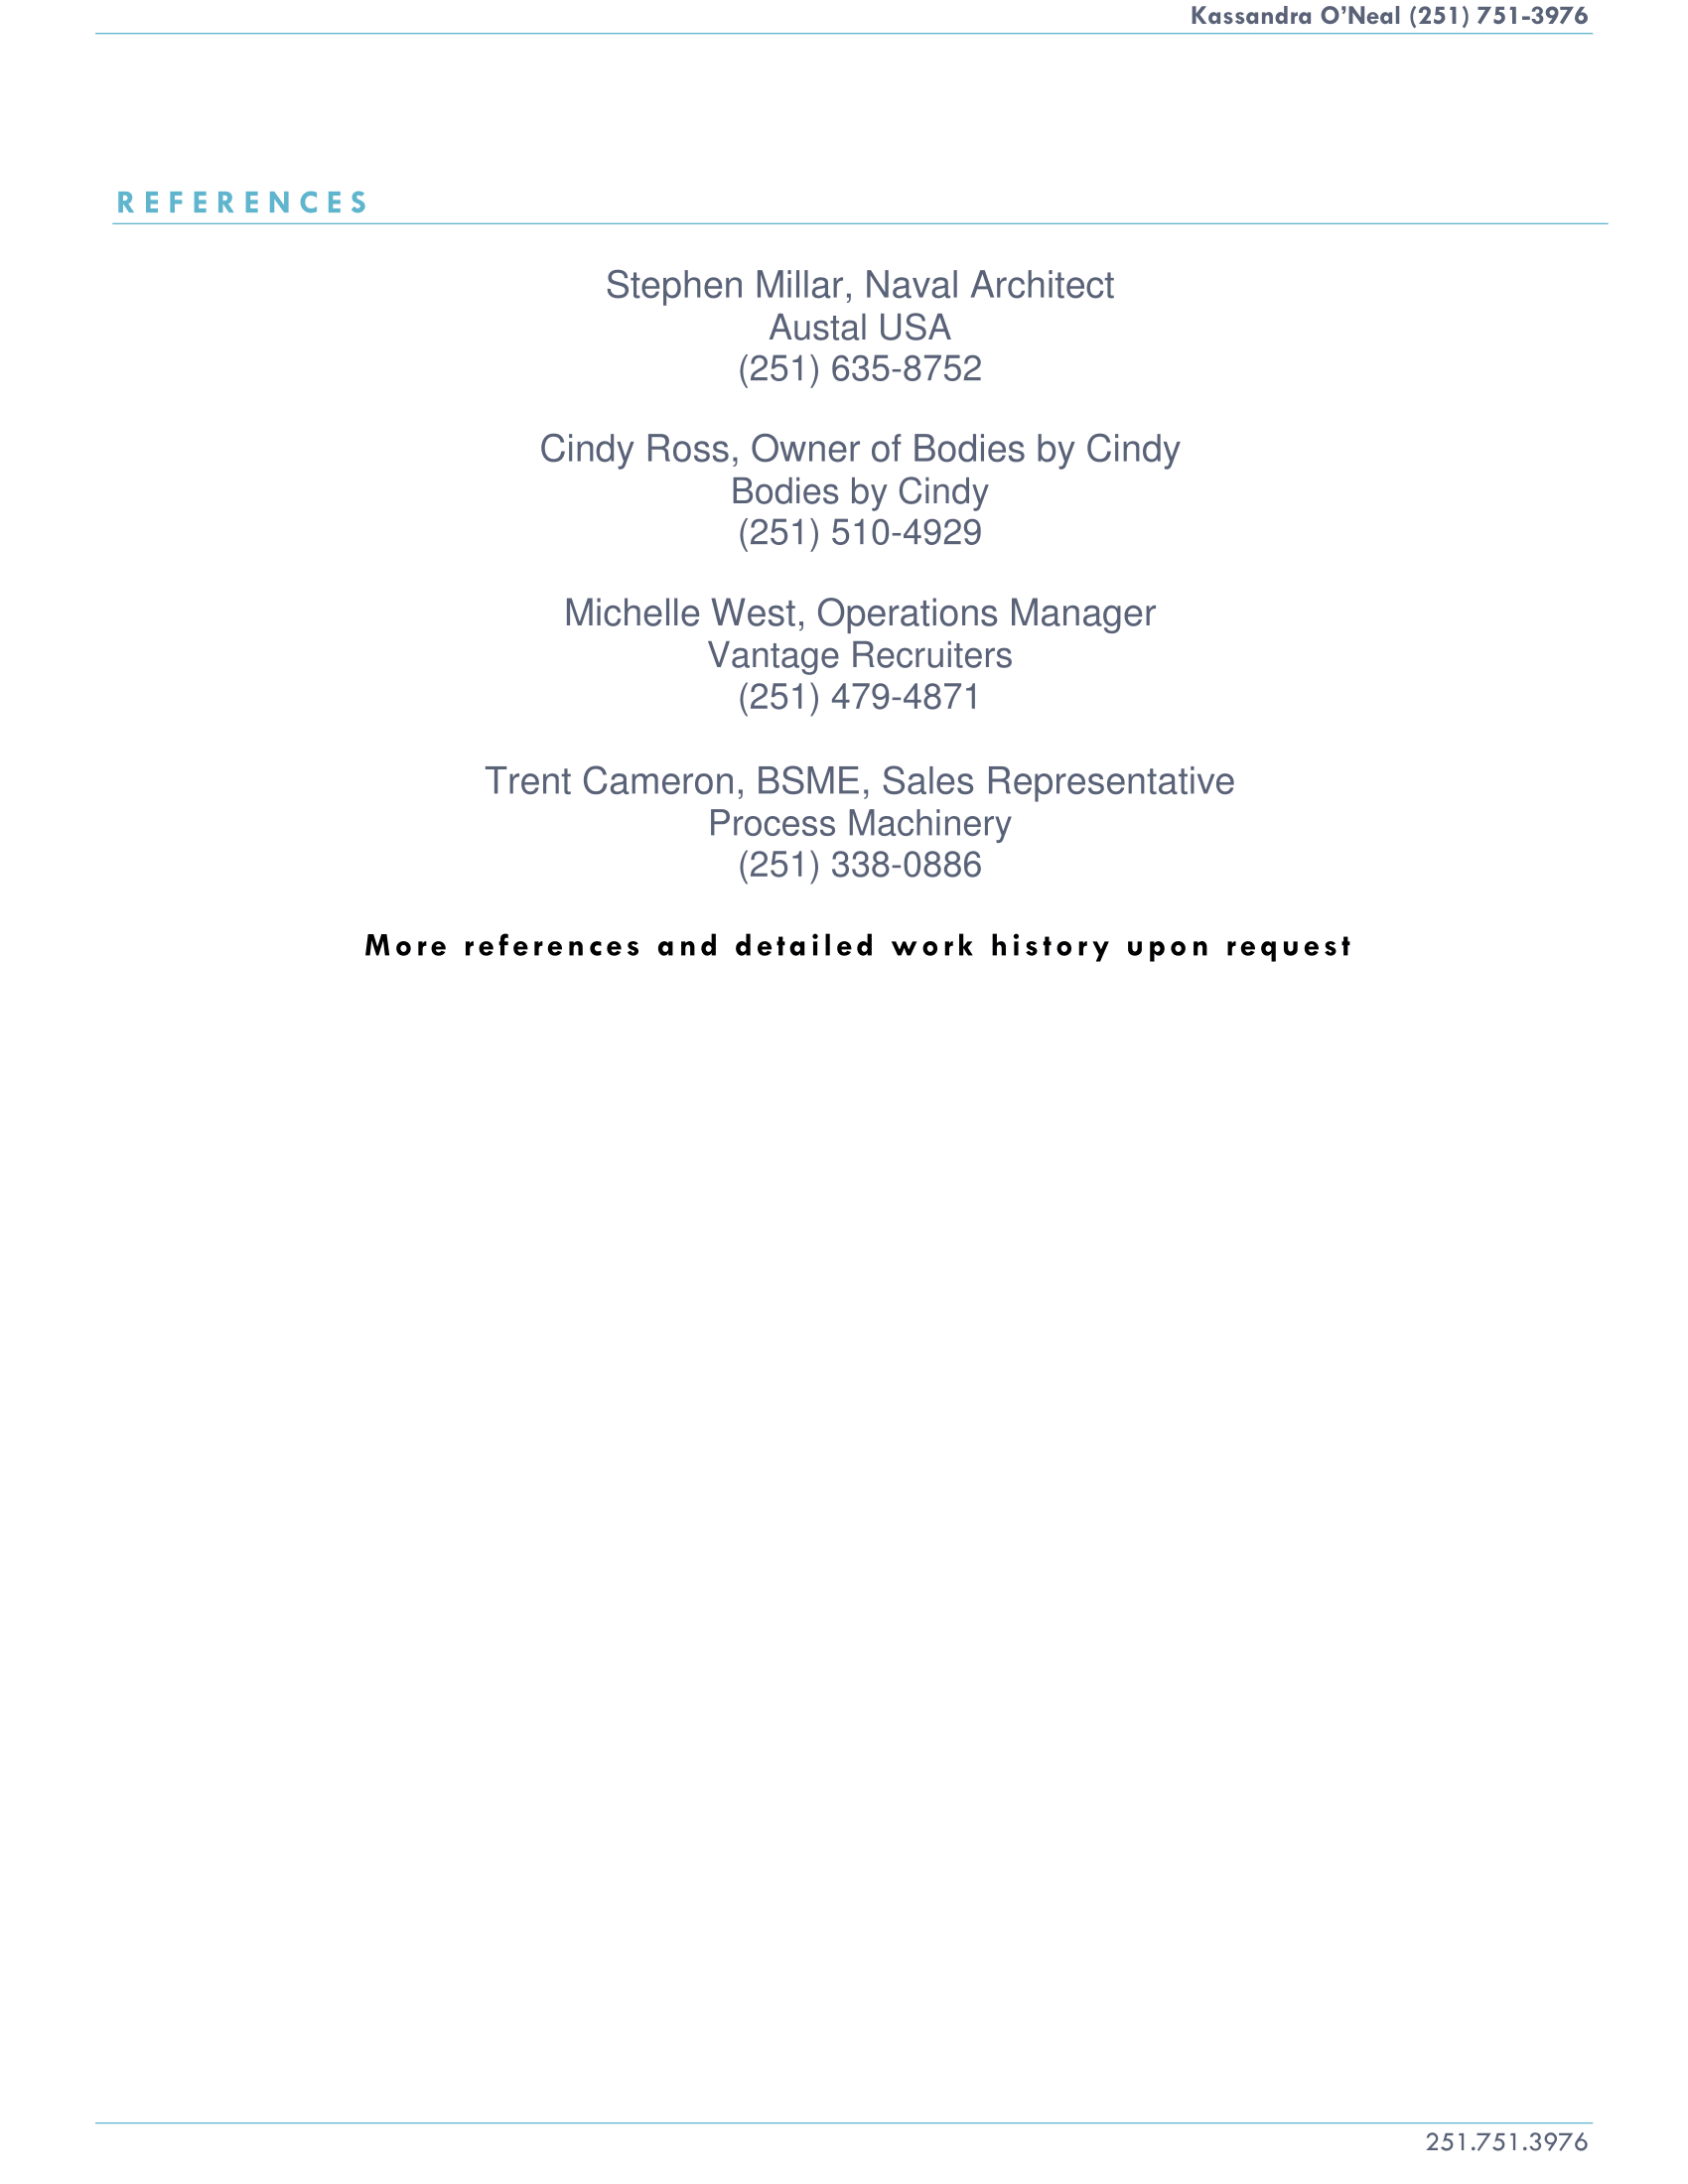 resume_2